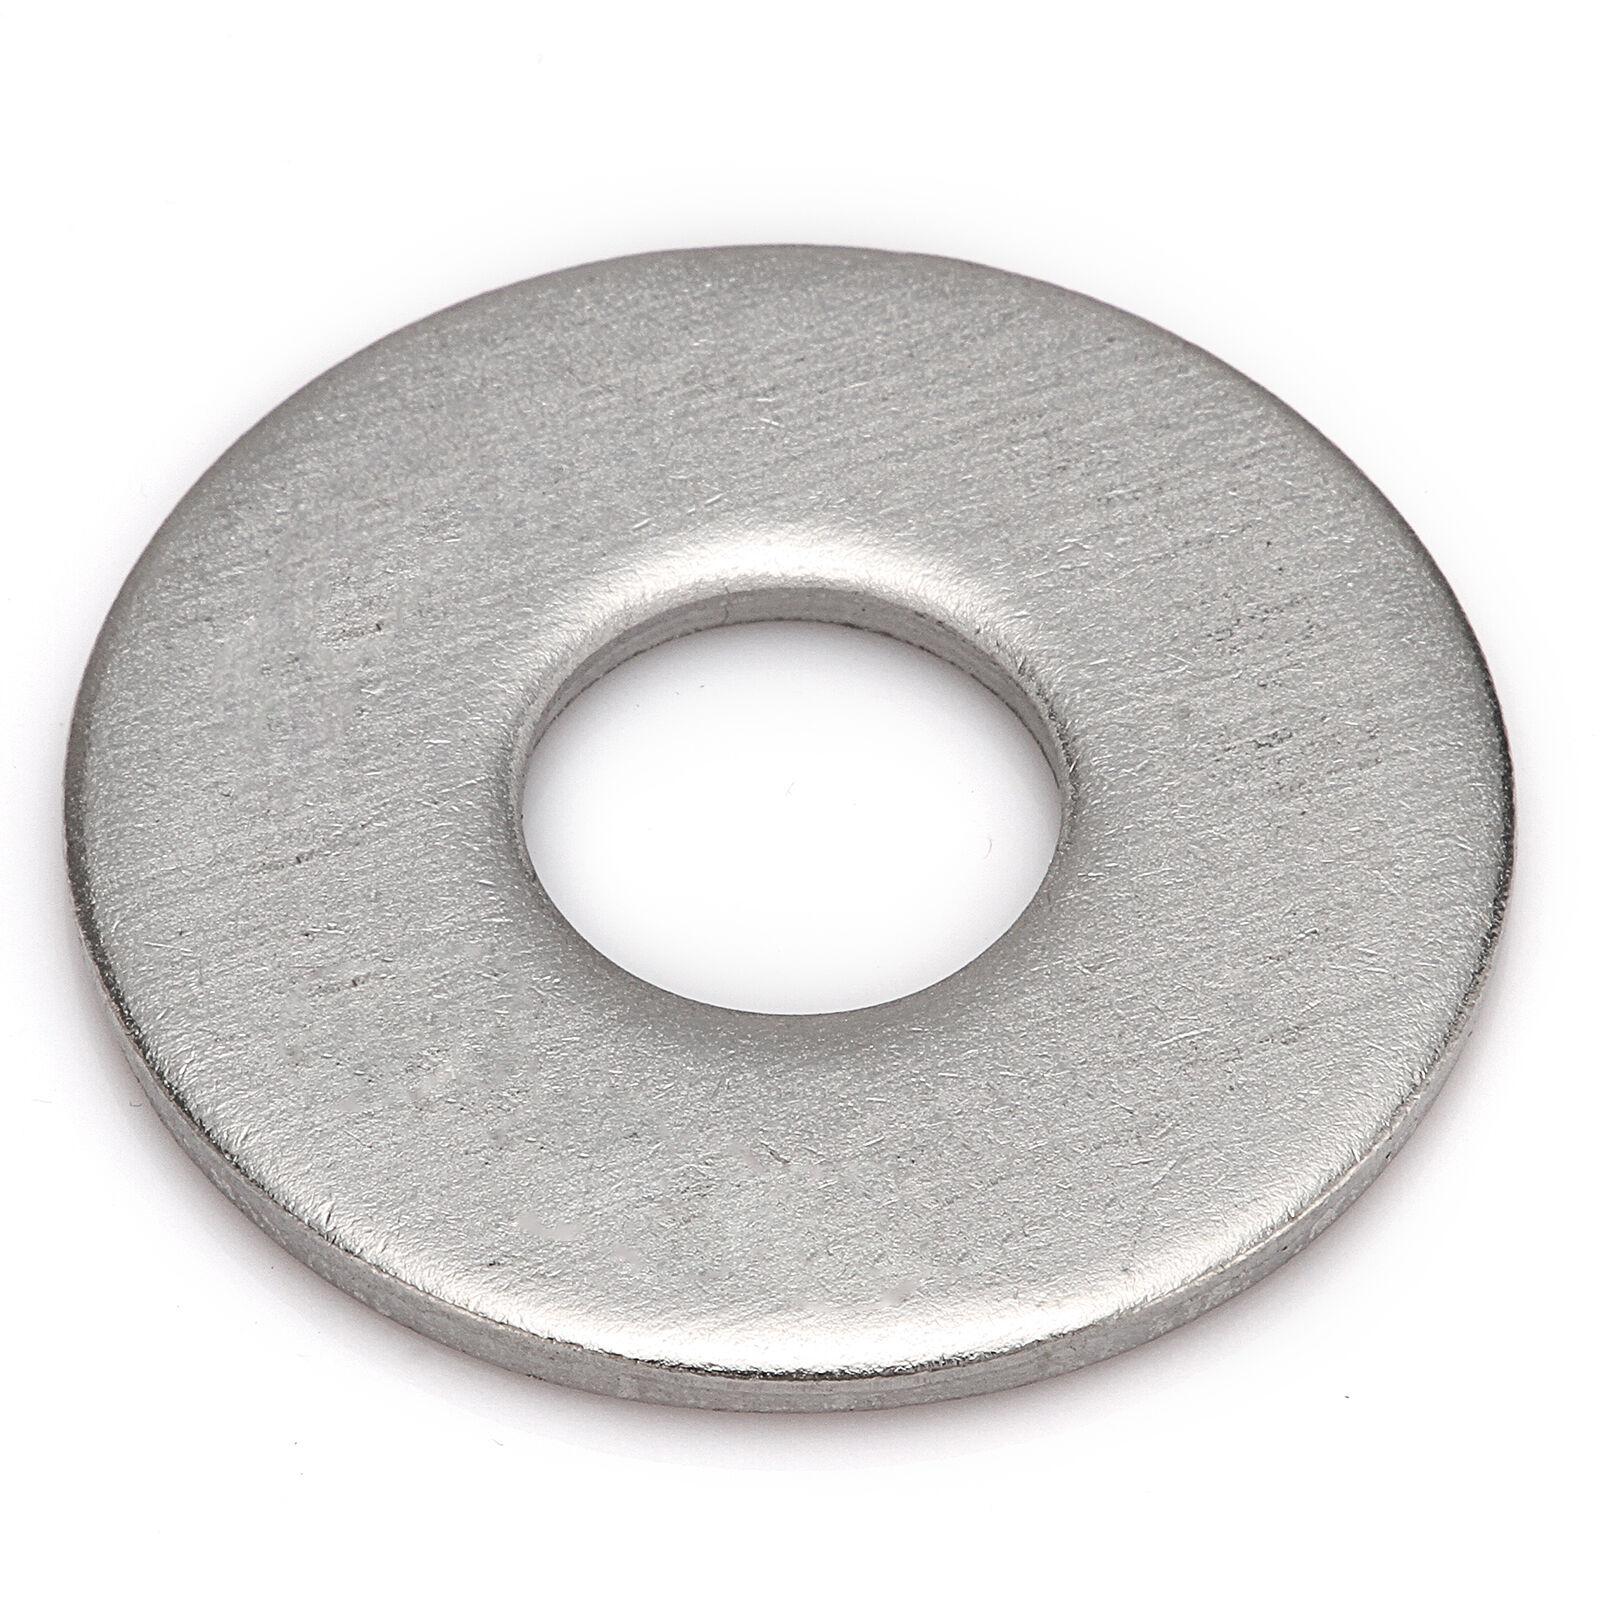 M3 M4 M5 M6 M8 M10 M12 M14 M16 M20 A2 Stainless Steel Penny Repair Flat Washers 7